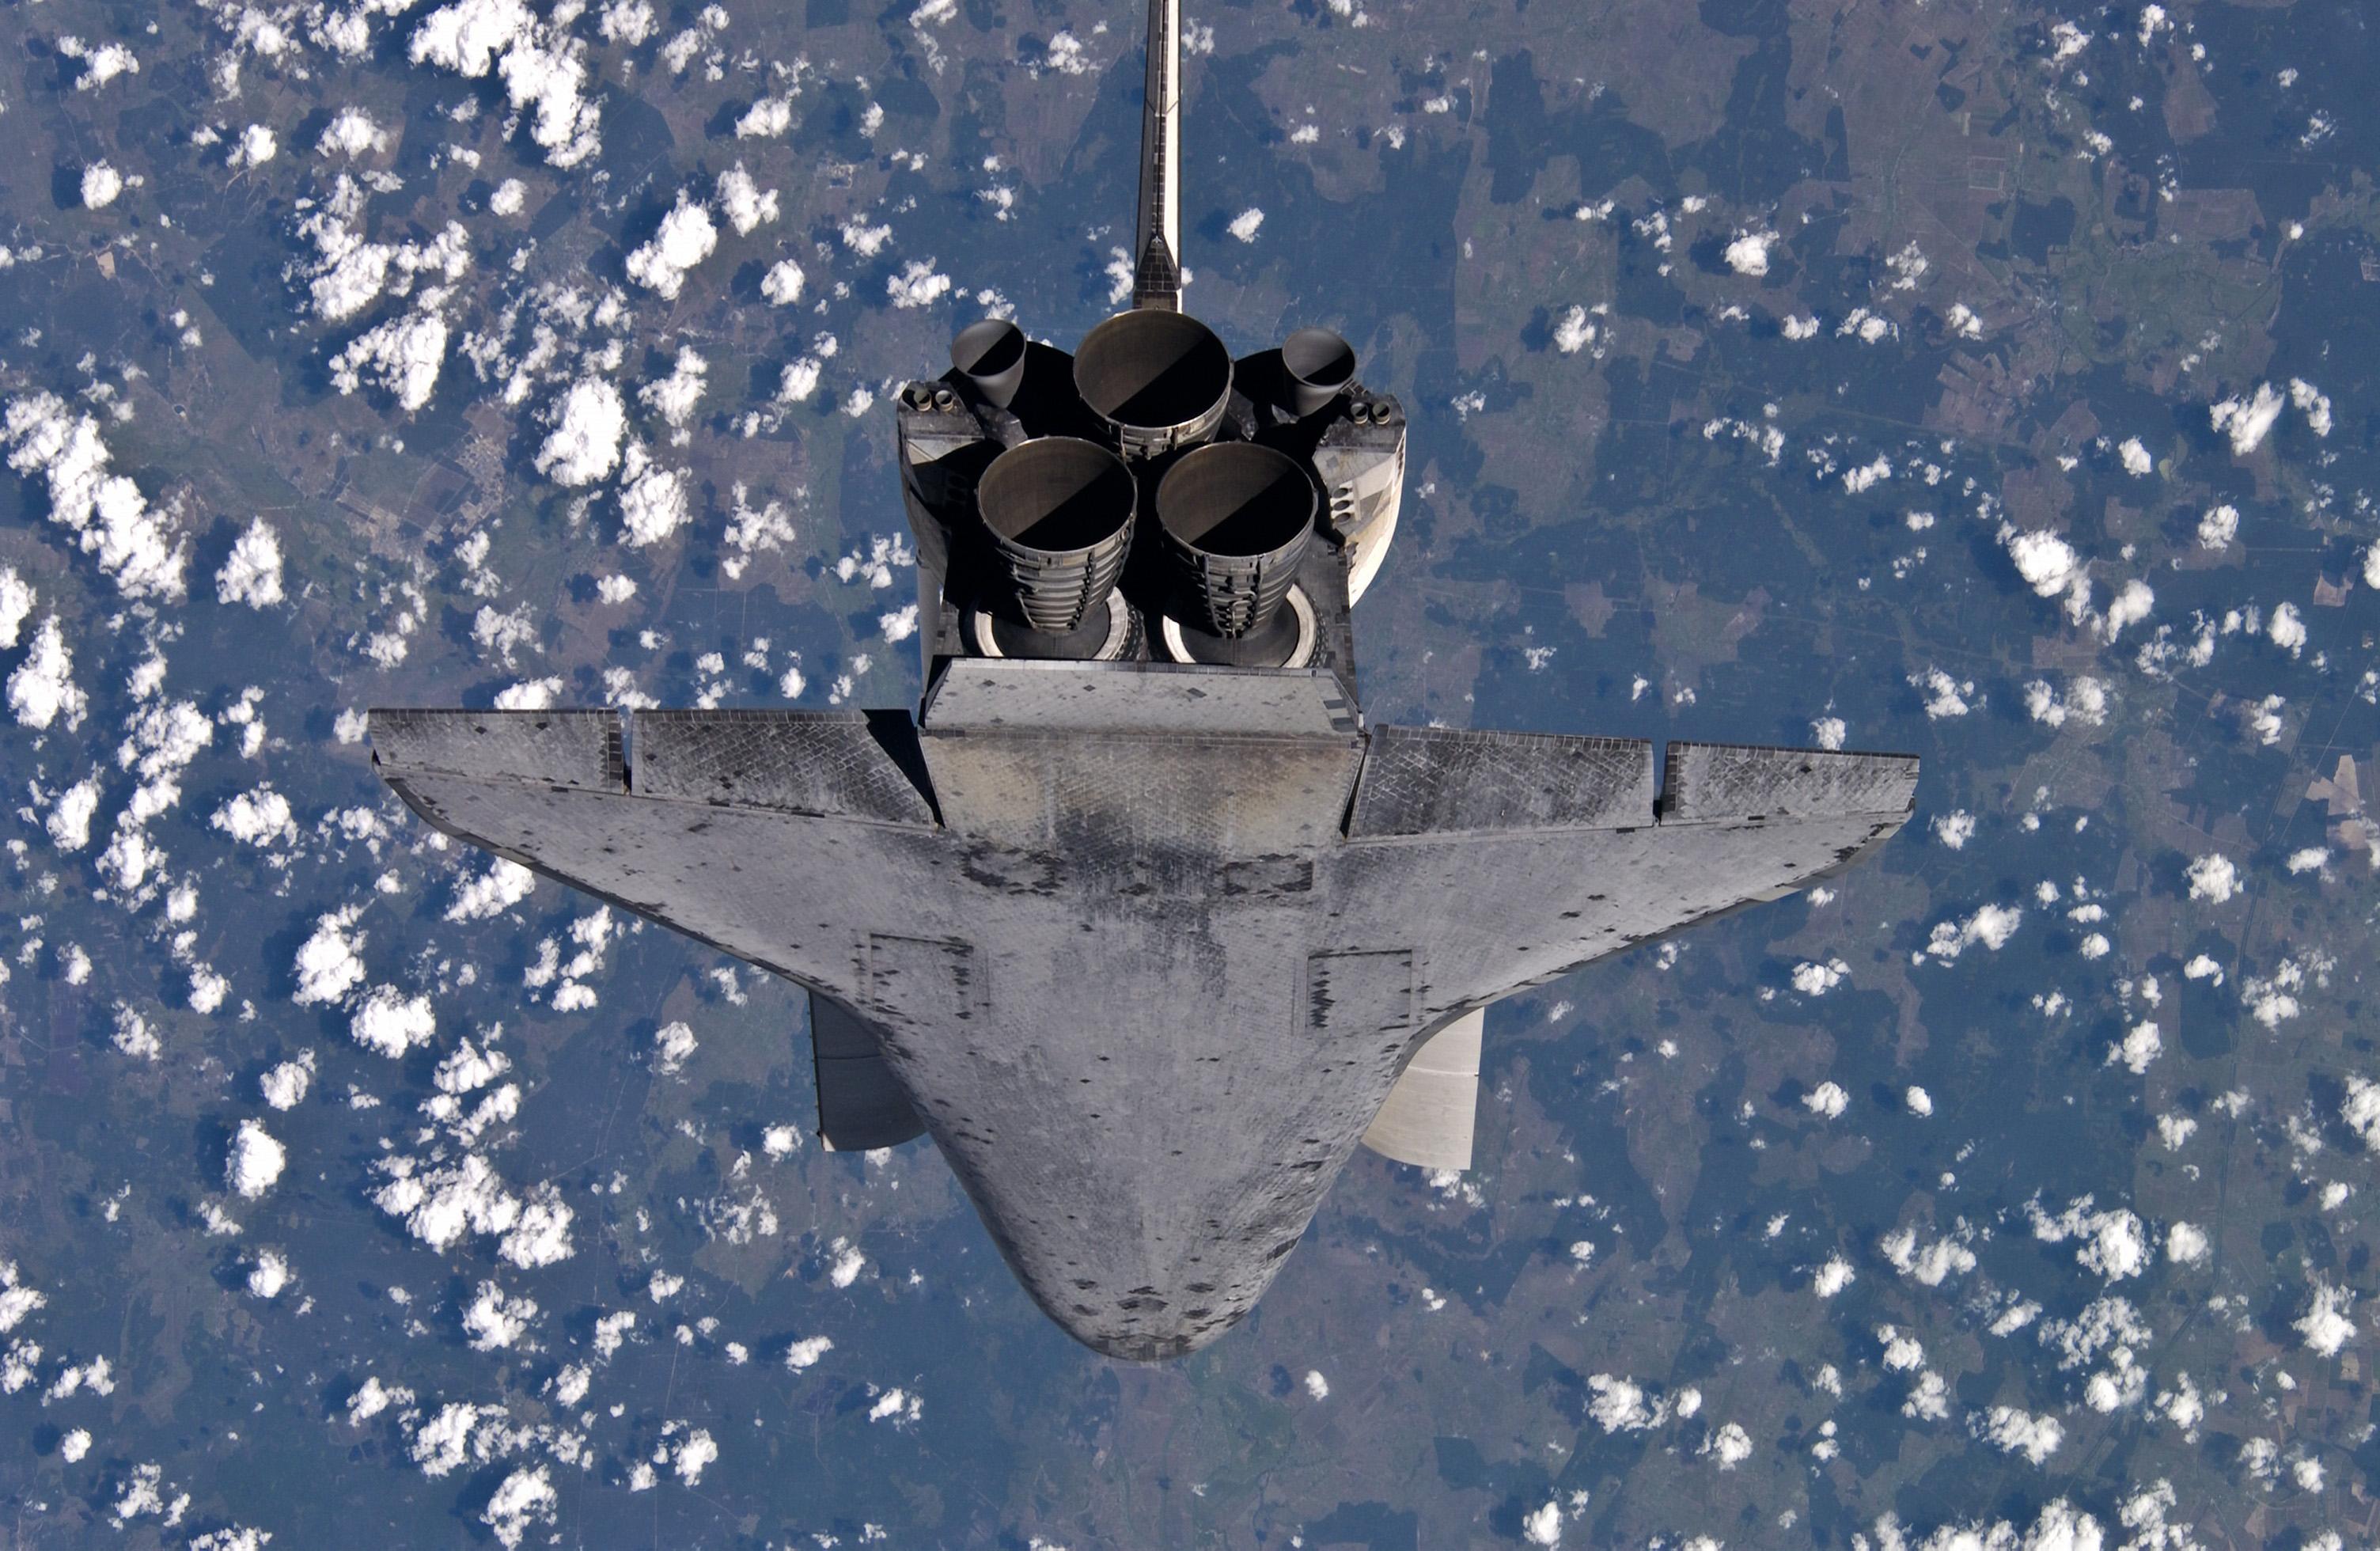 shield space shuttle shingles - photo #3